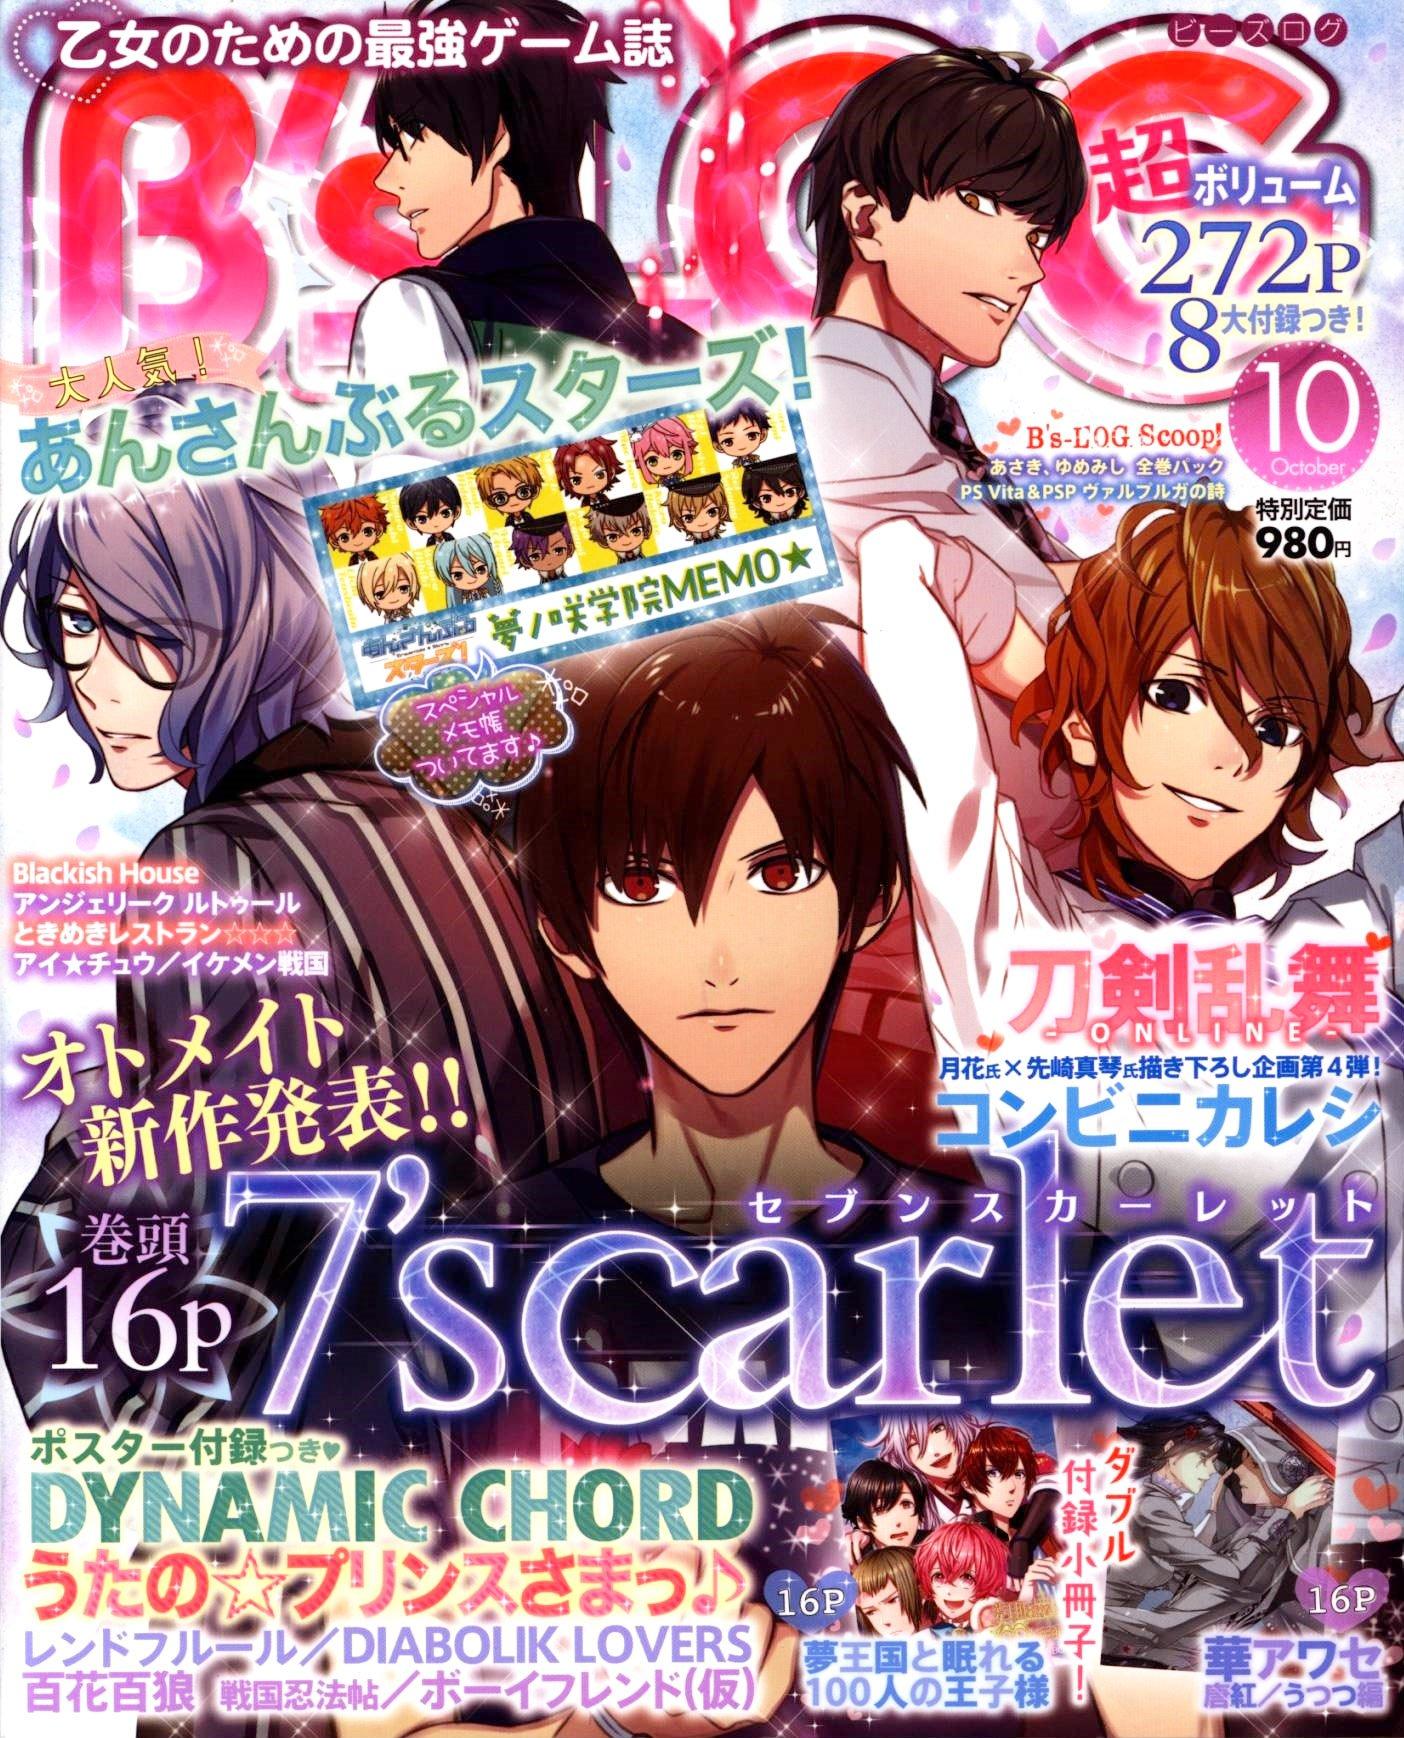 B's-LOG Issue 149 (October 2015)